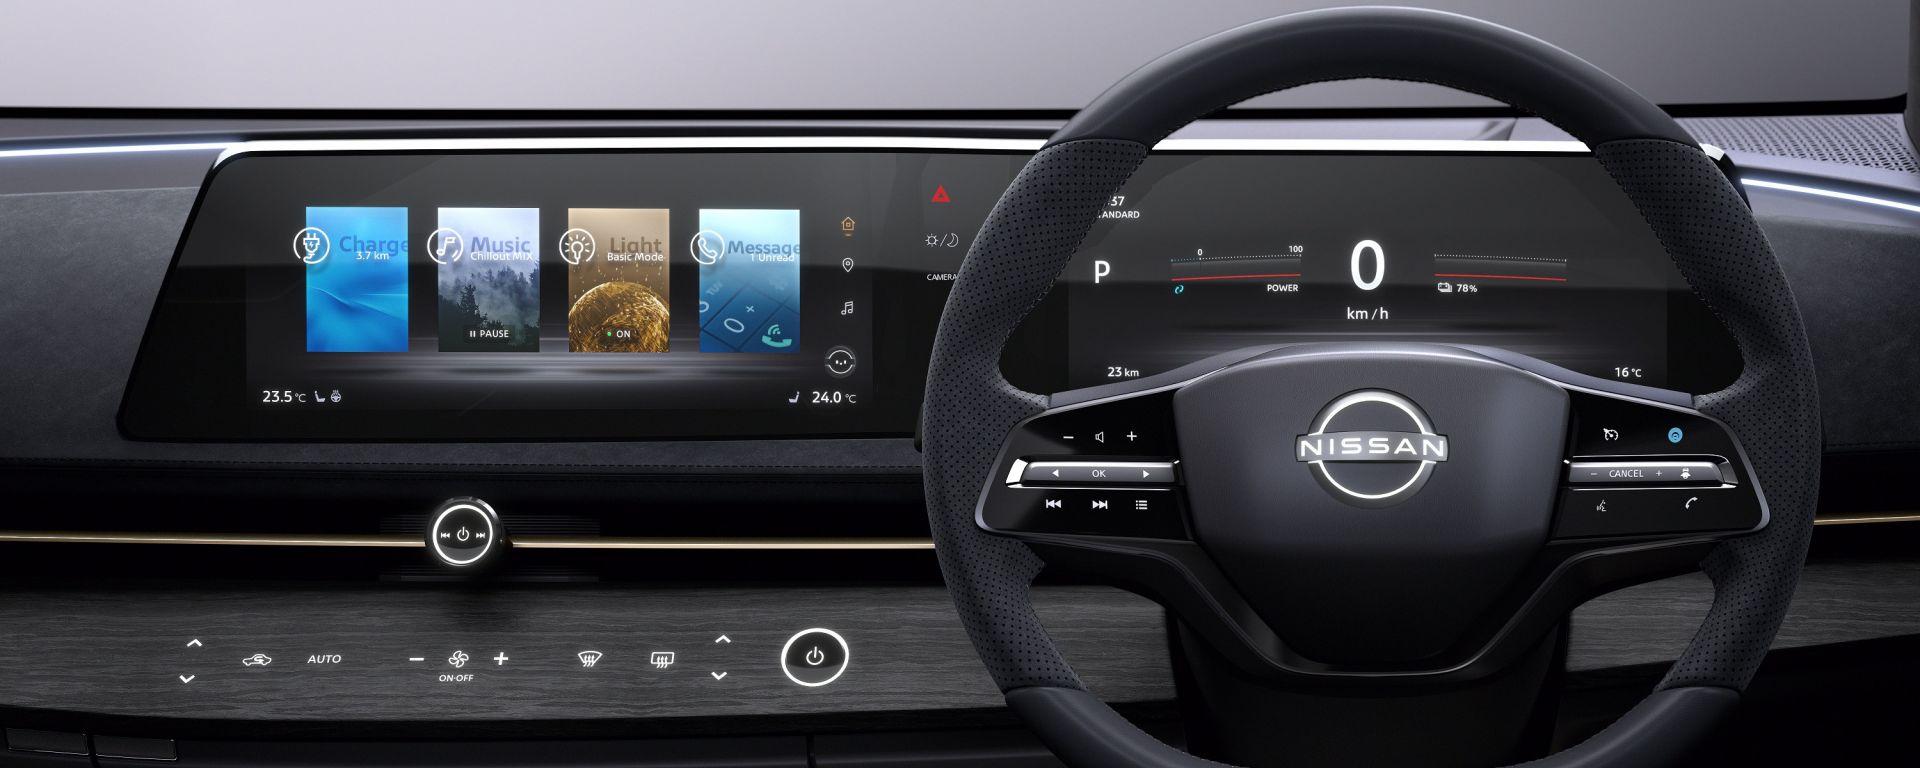 Nissan Ariya 2020: il display sarà curvo